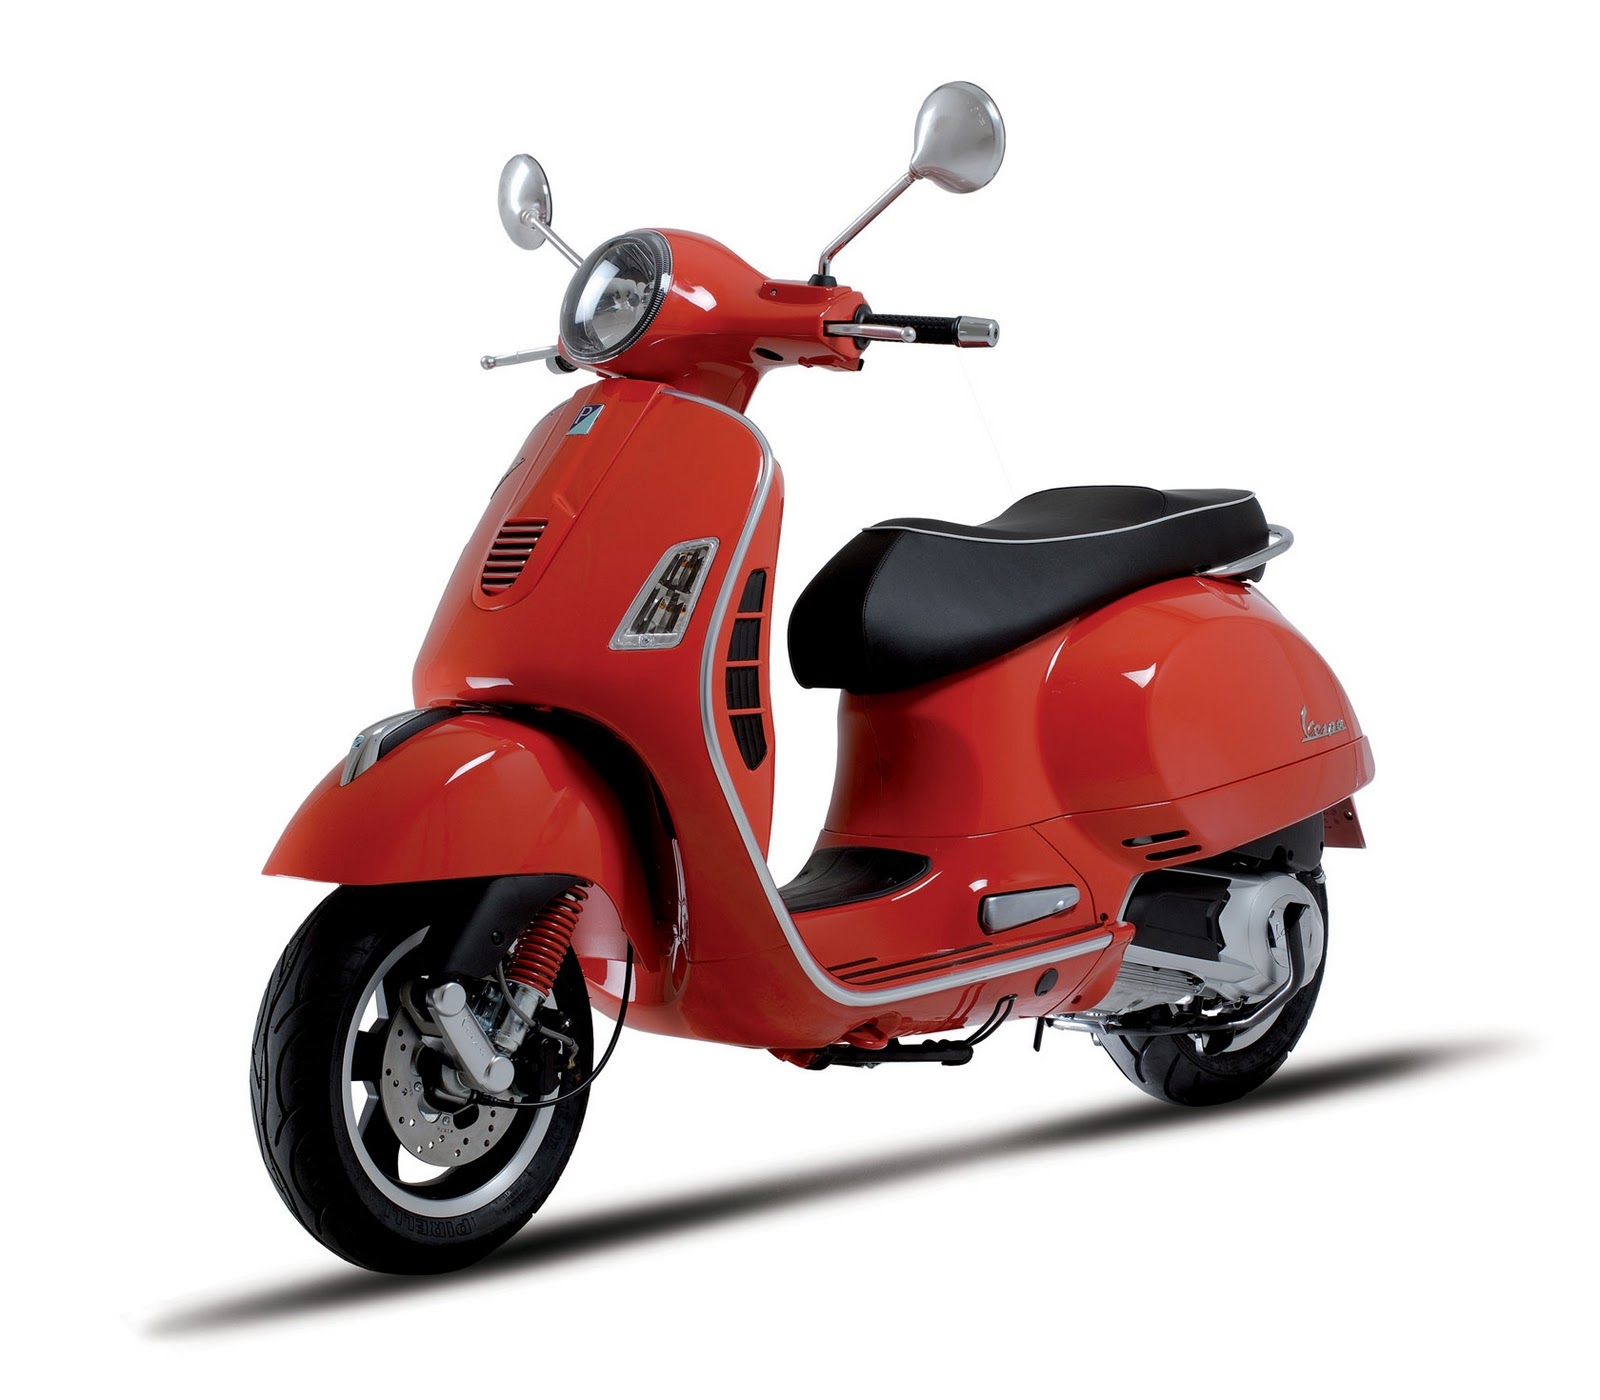 motorcycle pictures vespa gts 125 super 2009 europe. Black Bedroom Furniture Sets. Home Design Ideas